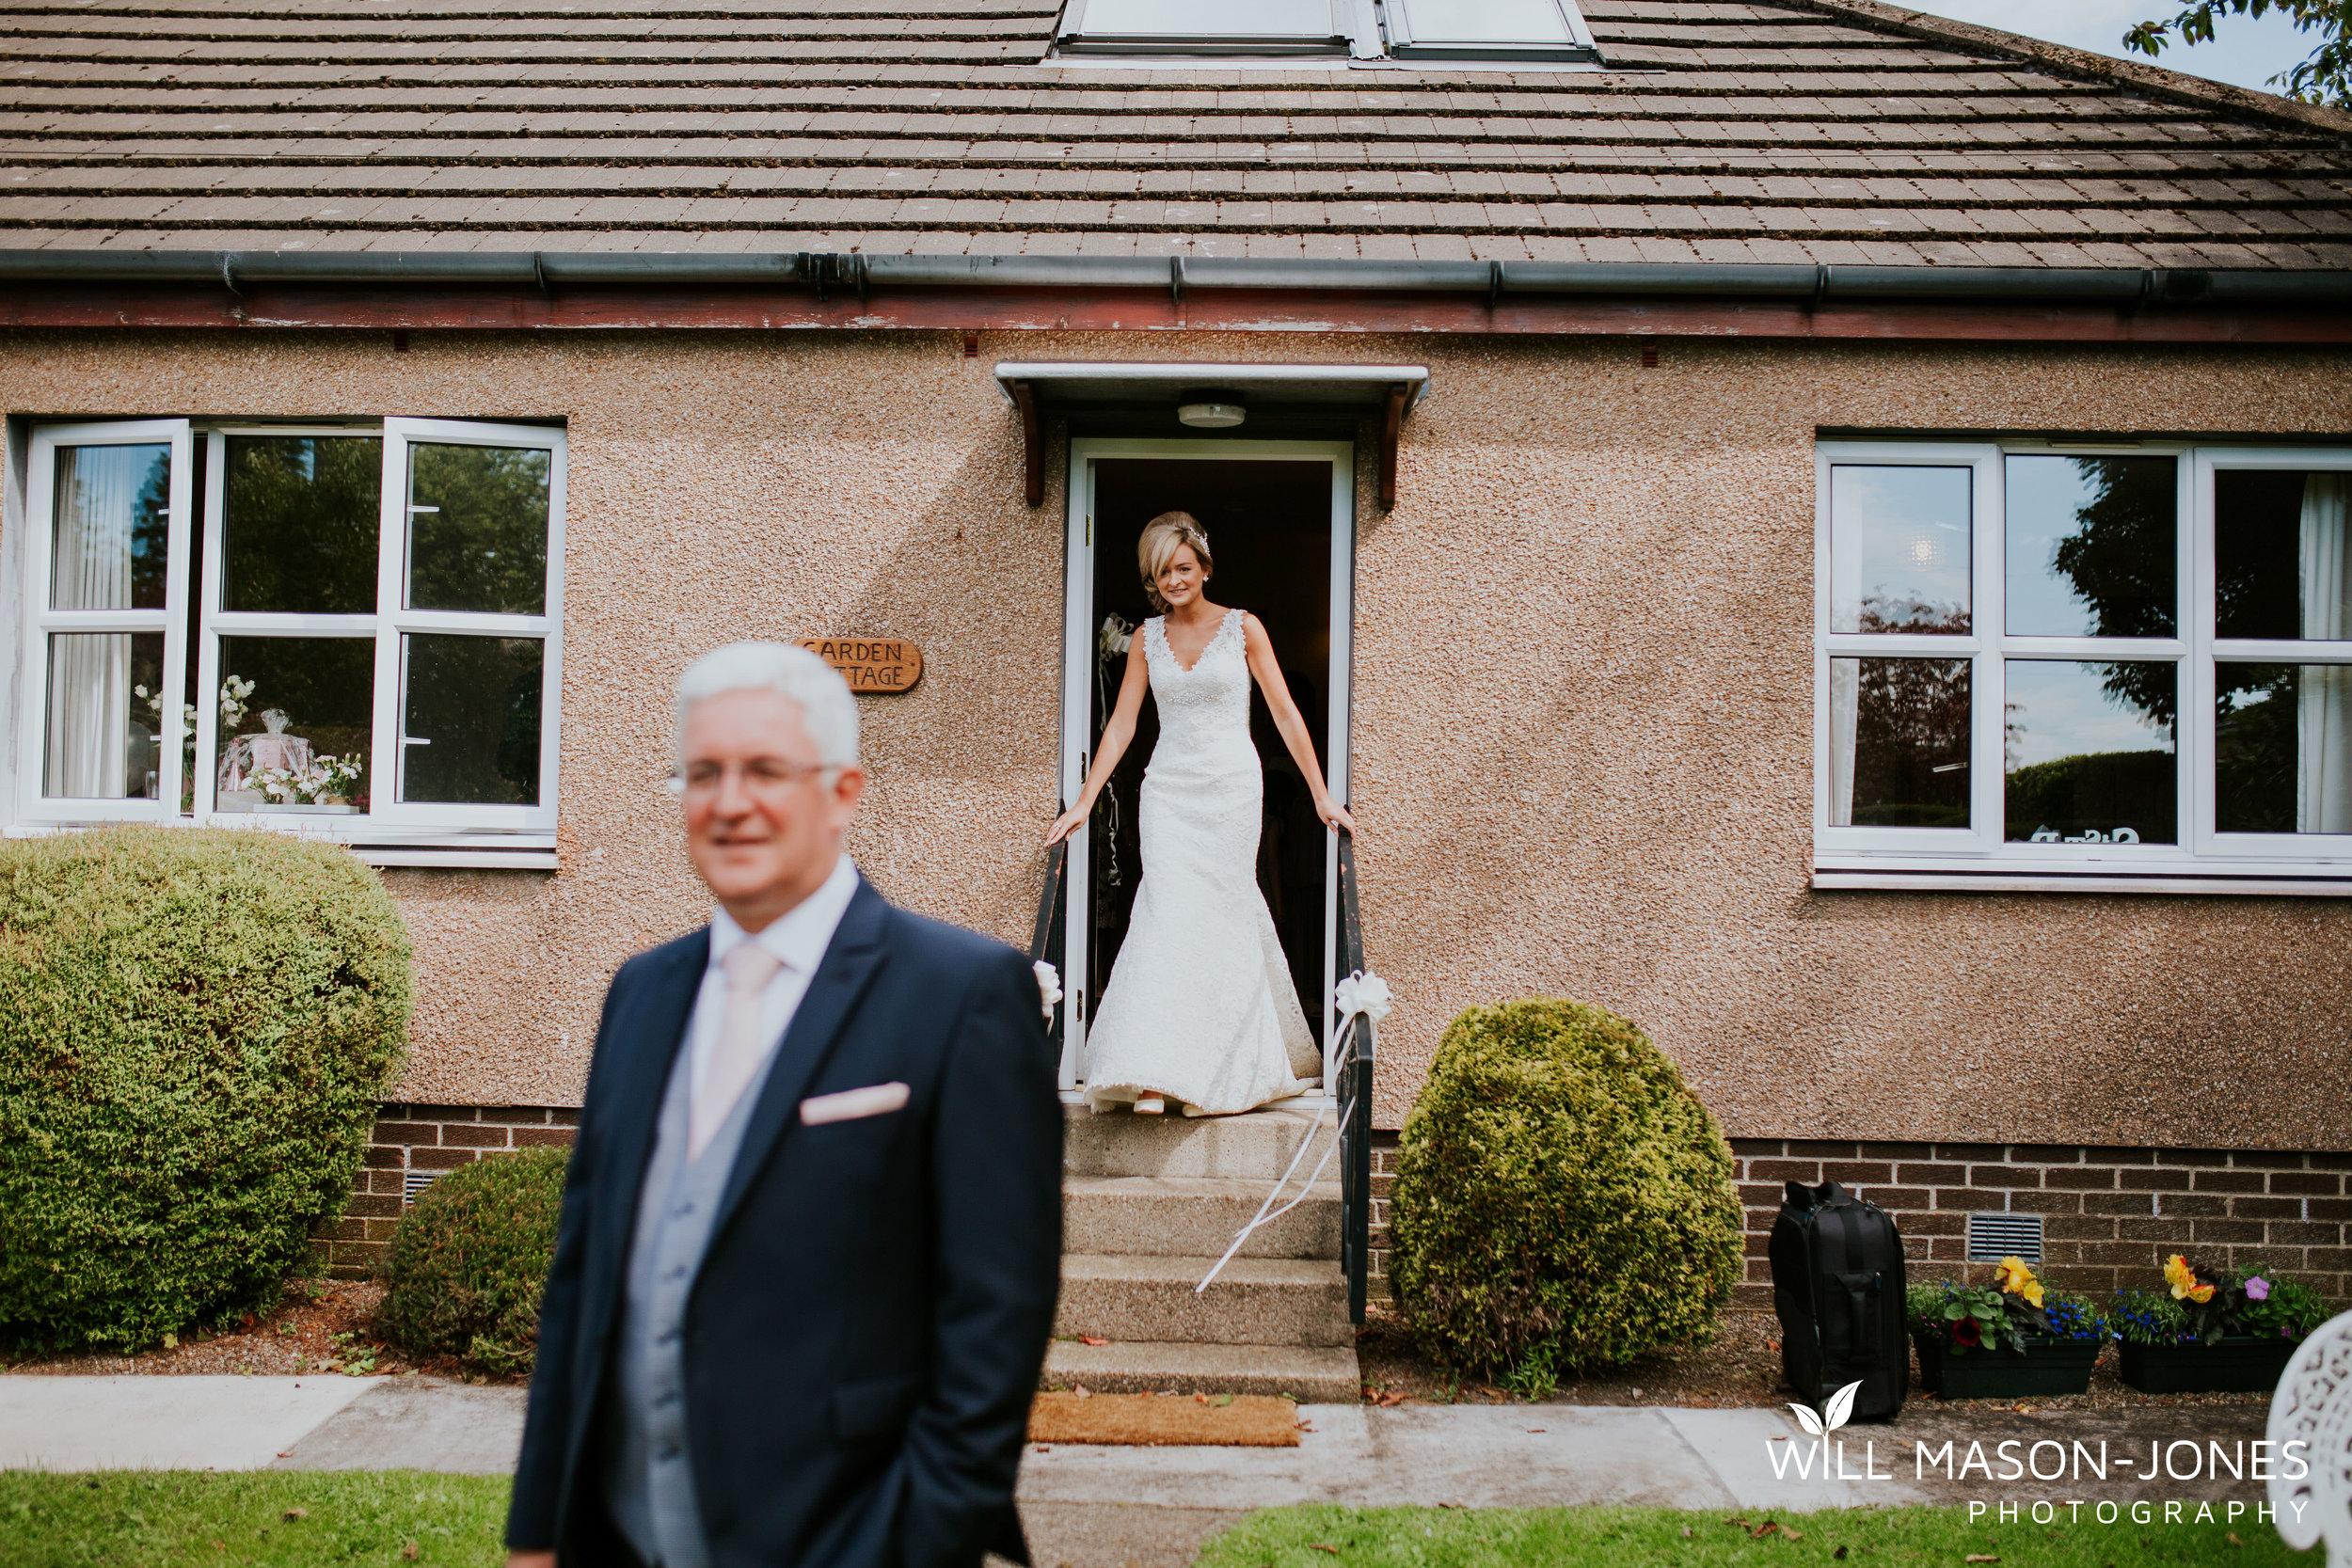 loch-lomond-destination-wedding-photographer-scotland-uk-wales-21.jpg